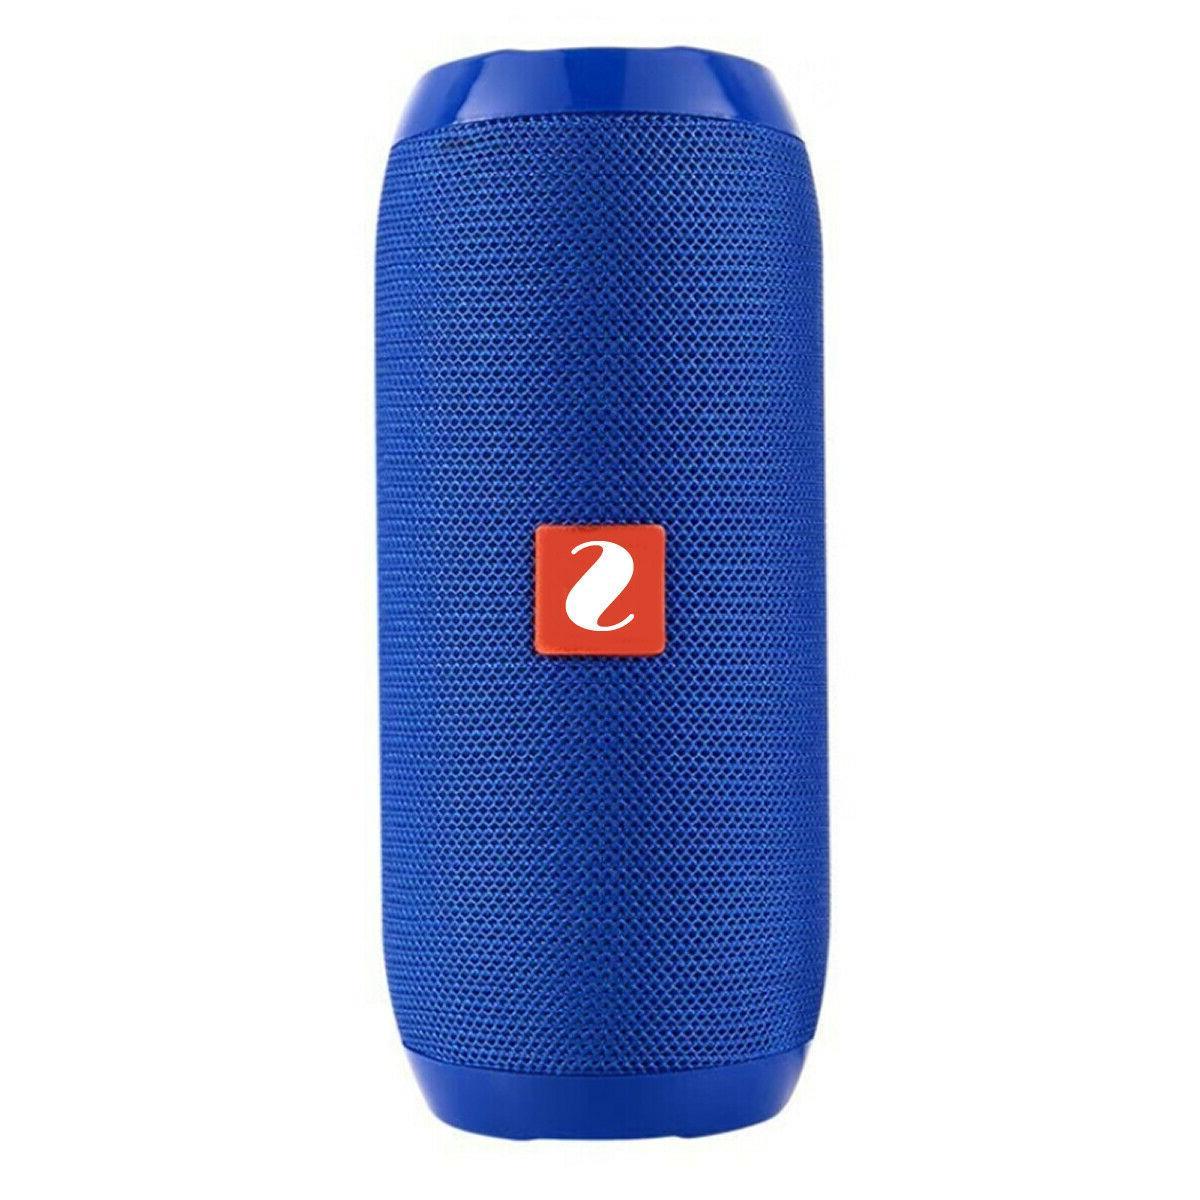 LOUD Bluetooth Waterproof Outdoor Stereo USB/TF/FM